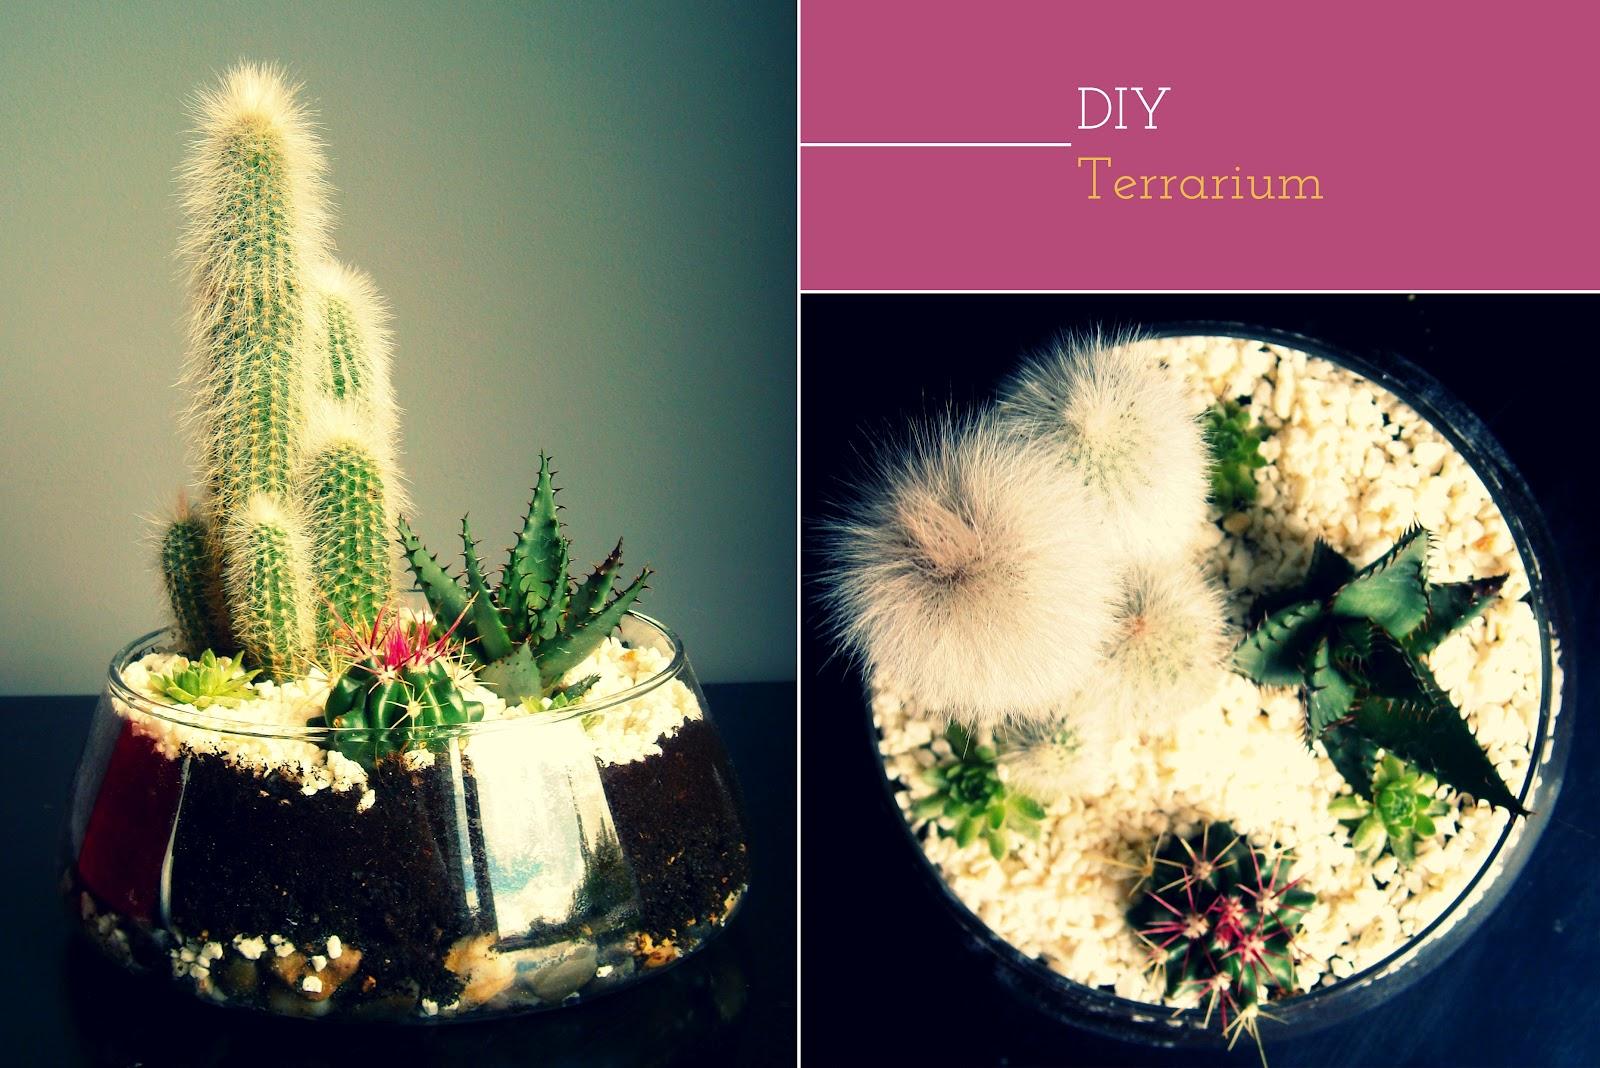 Sugar And Dinosaurs Diy 3 Un Terrarium De Cactus